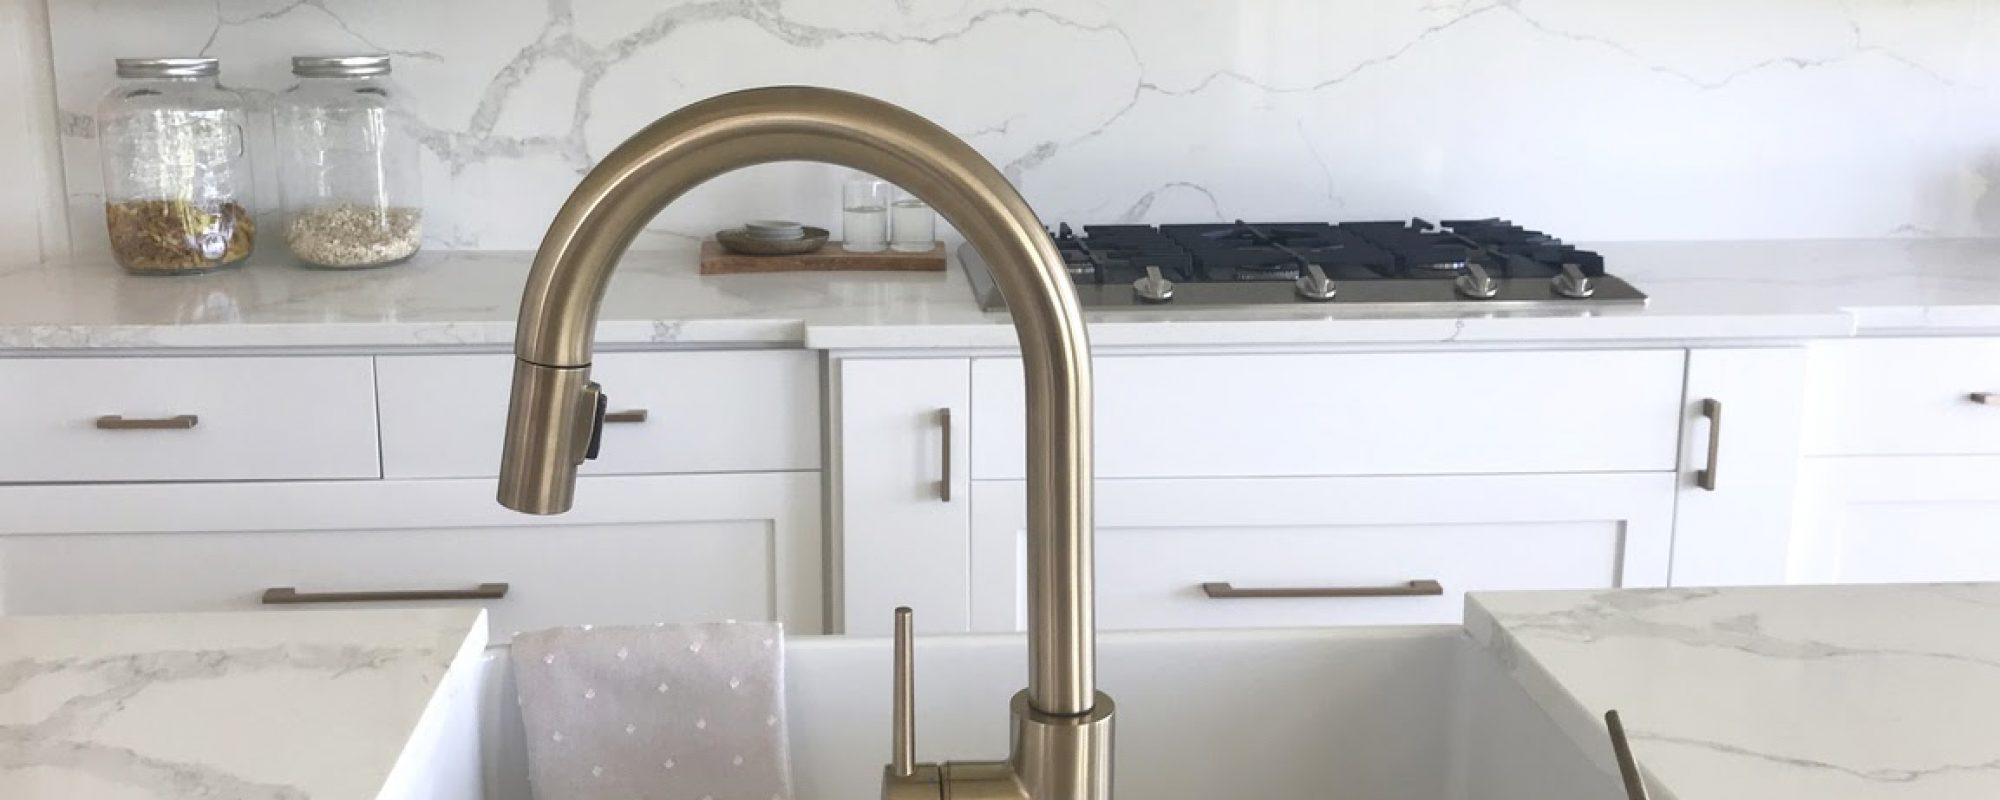 Countertop with a sink showing quartz vs quartzite